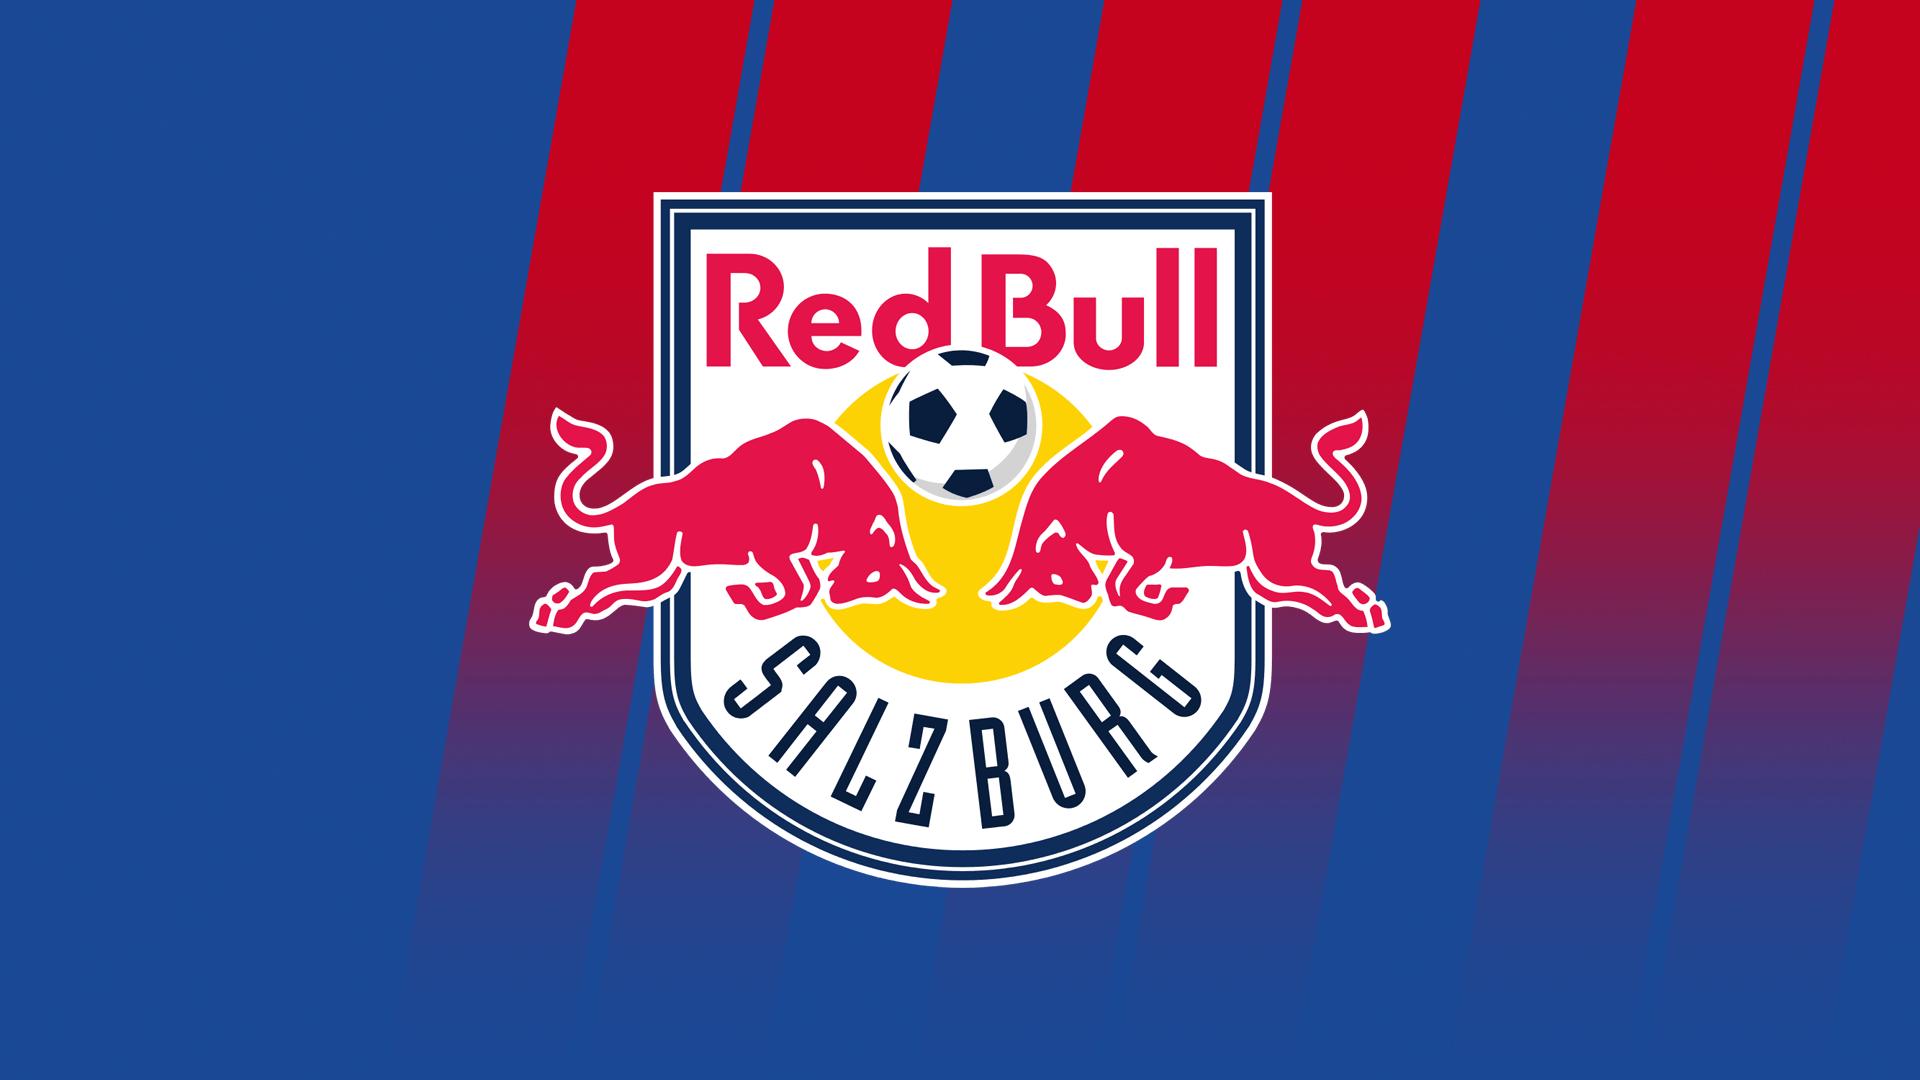 RB Salzburg (SLZ)